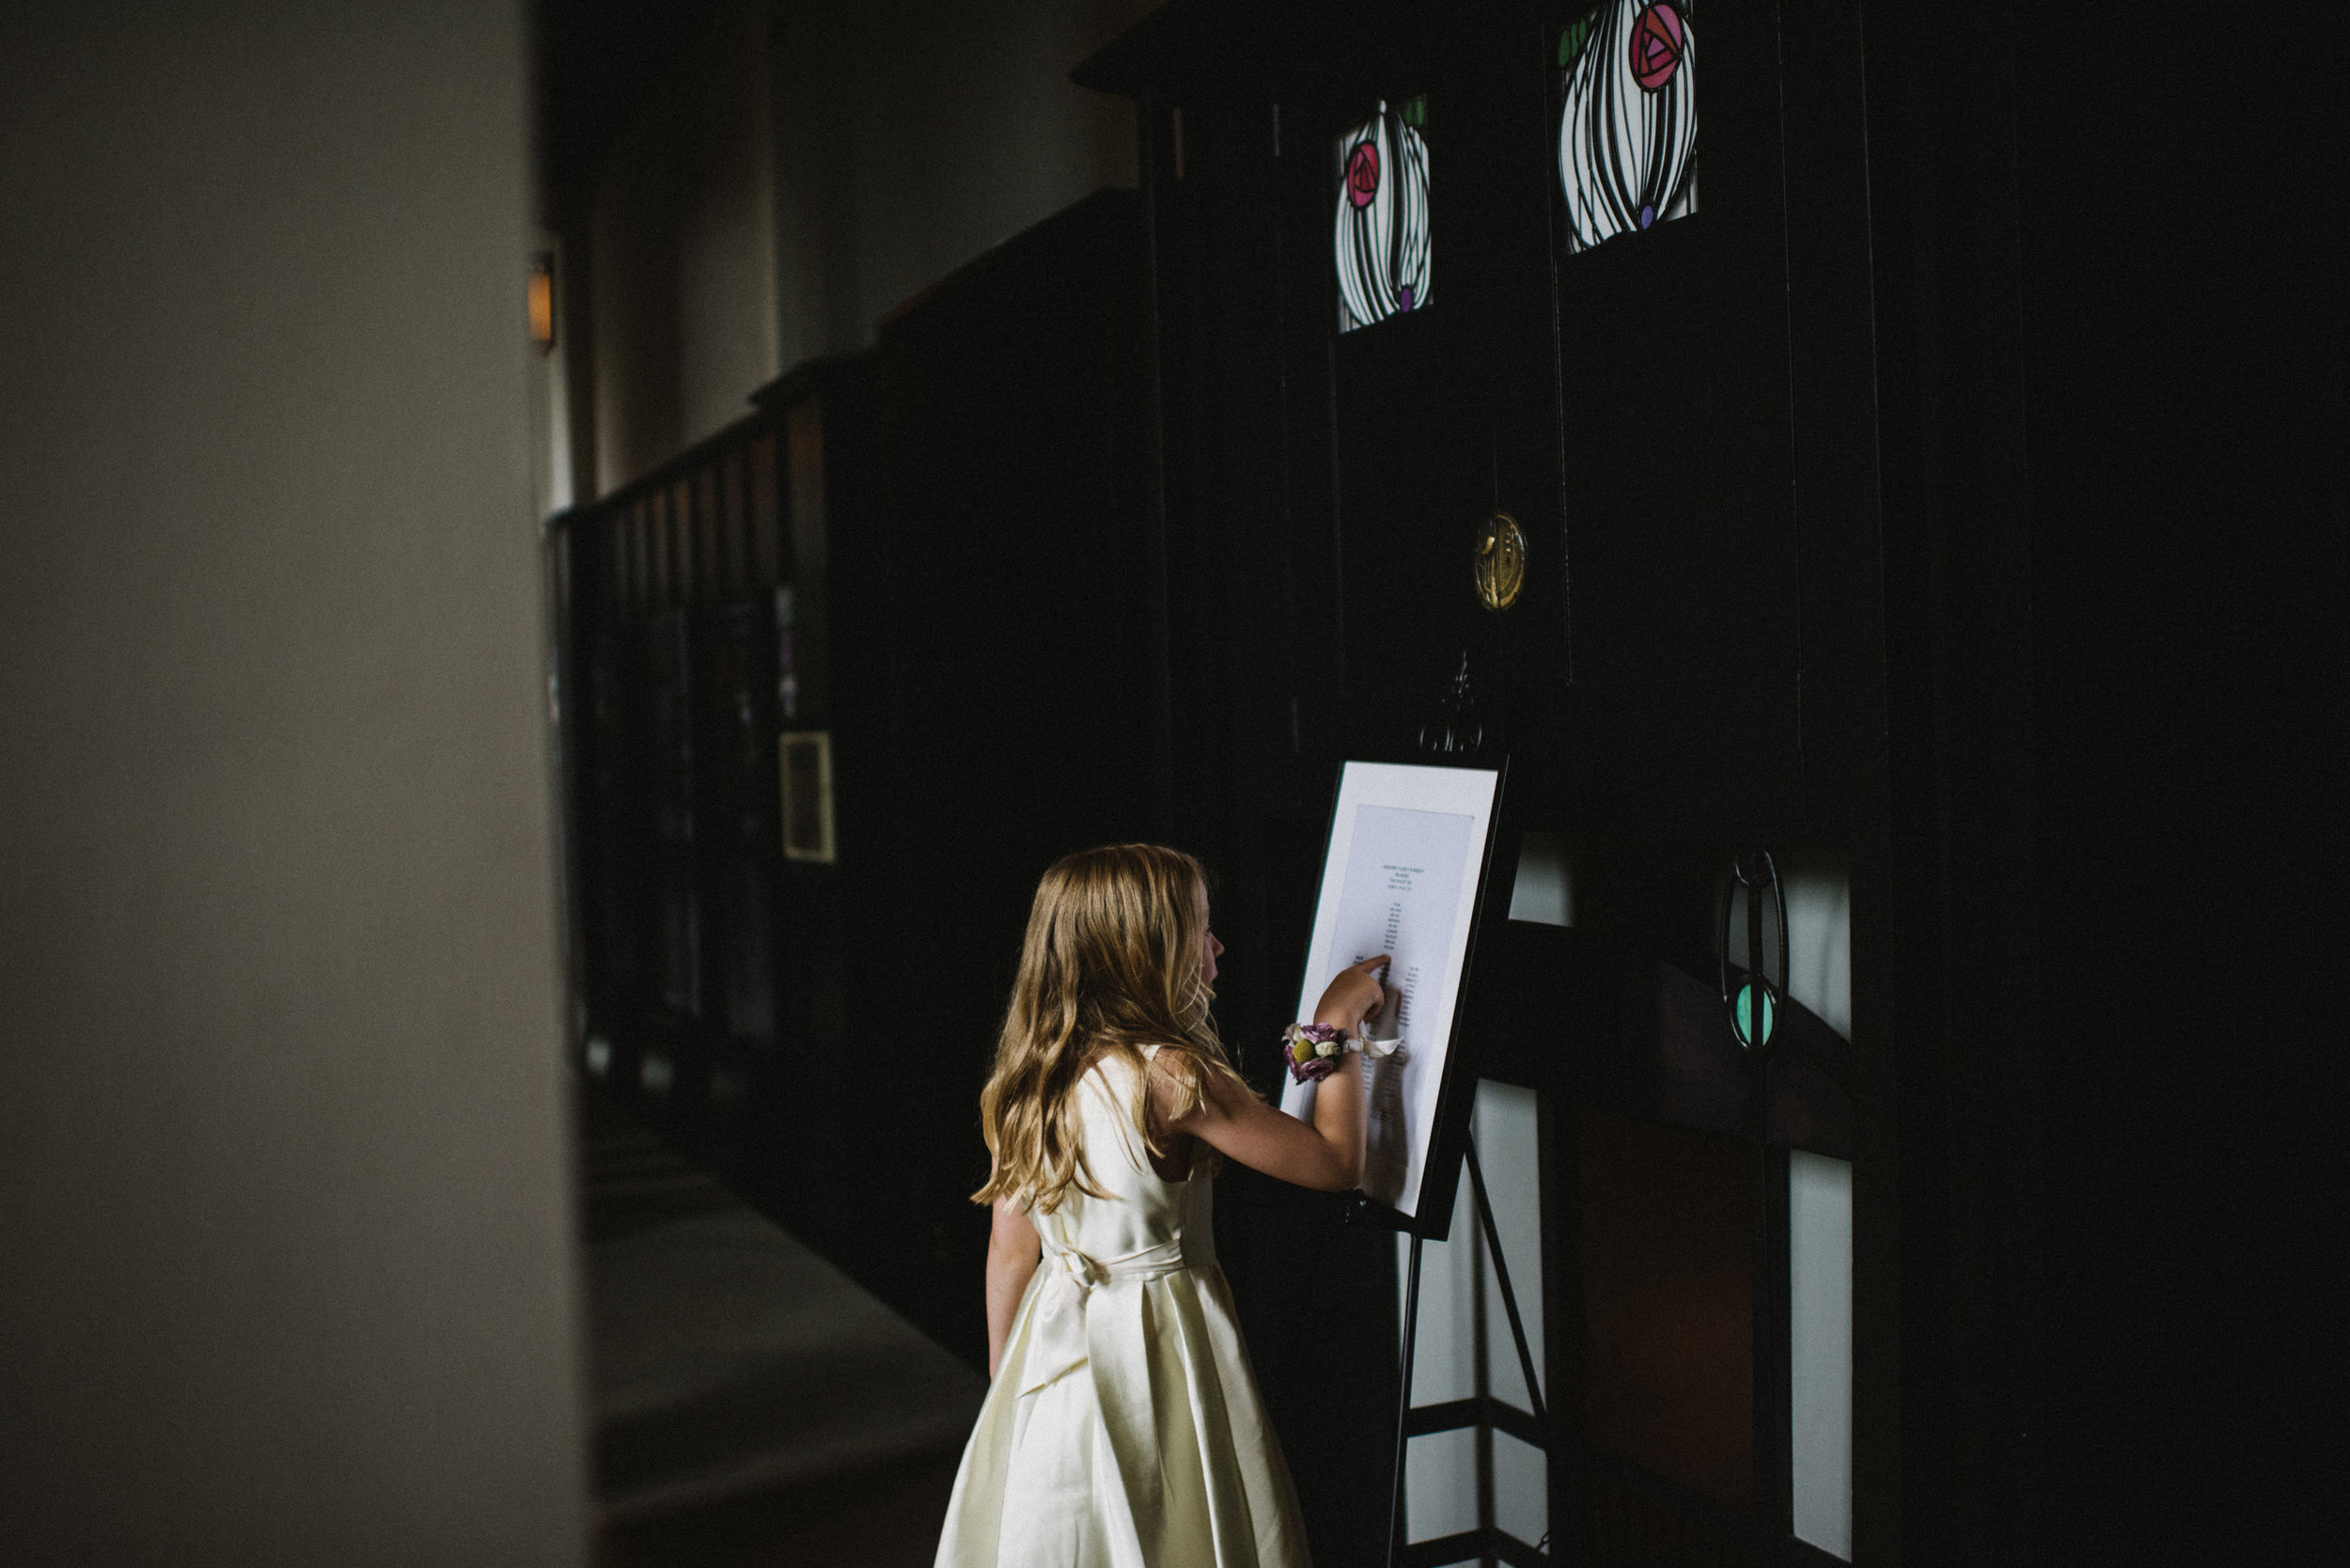 0041-LISA-DEVINE-PHOTOGRAPHY-ALTERNATIVE-WEDDING-PHOTOGRAPHY-SCOTLAND-DESTINATION-WEDDINGS-GLASGOW-WEDDINGS-COOL-WEDDINGS-STYLISH-WEDDINGS.JPG